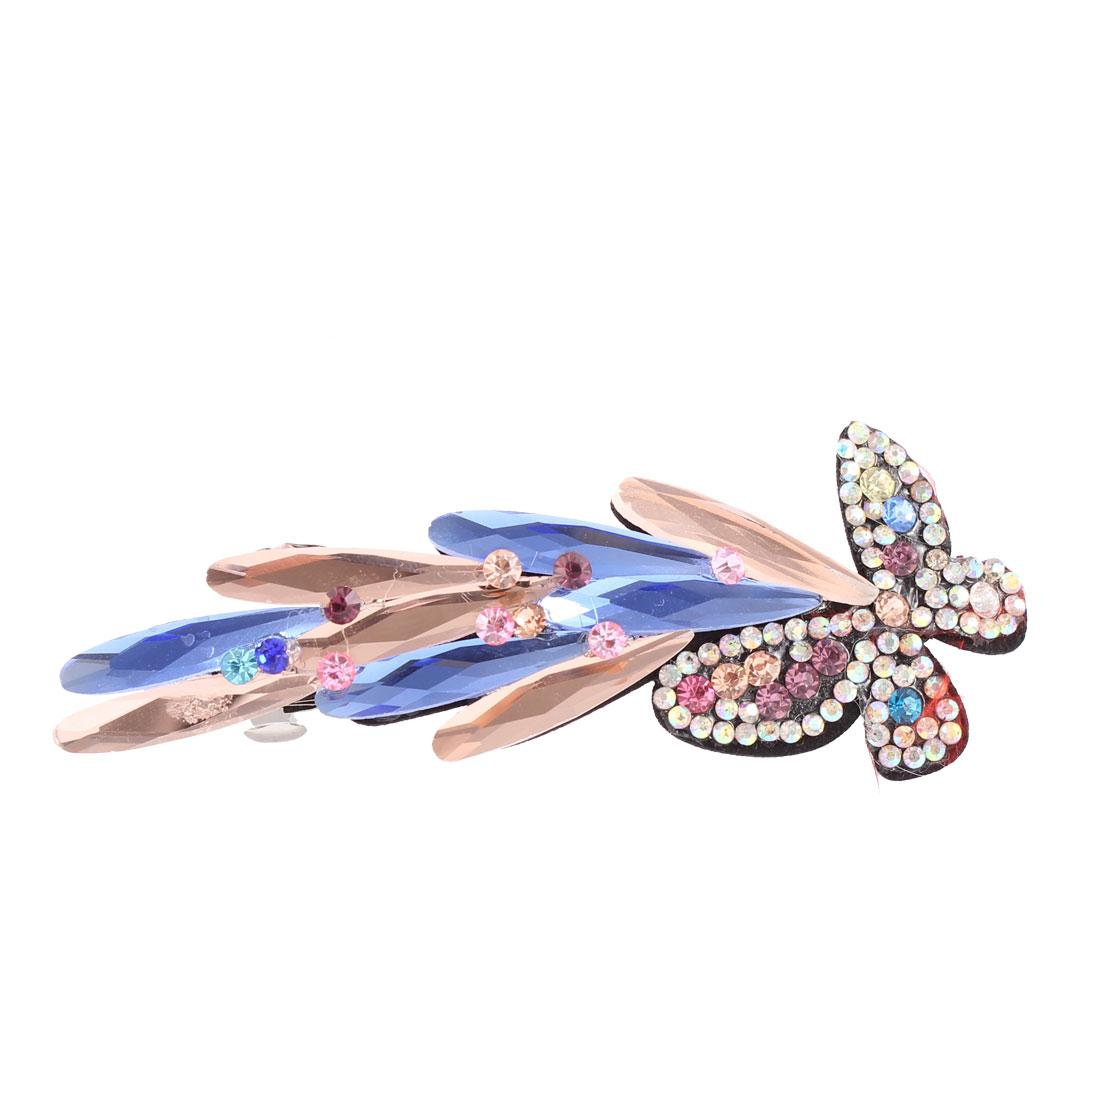 Plastic Crystal Rhinestone Decor Butterfly Shape Hair Clip Barrette Hairpin